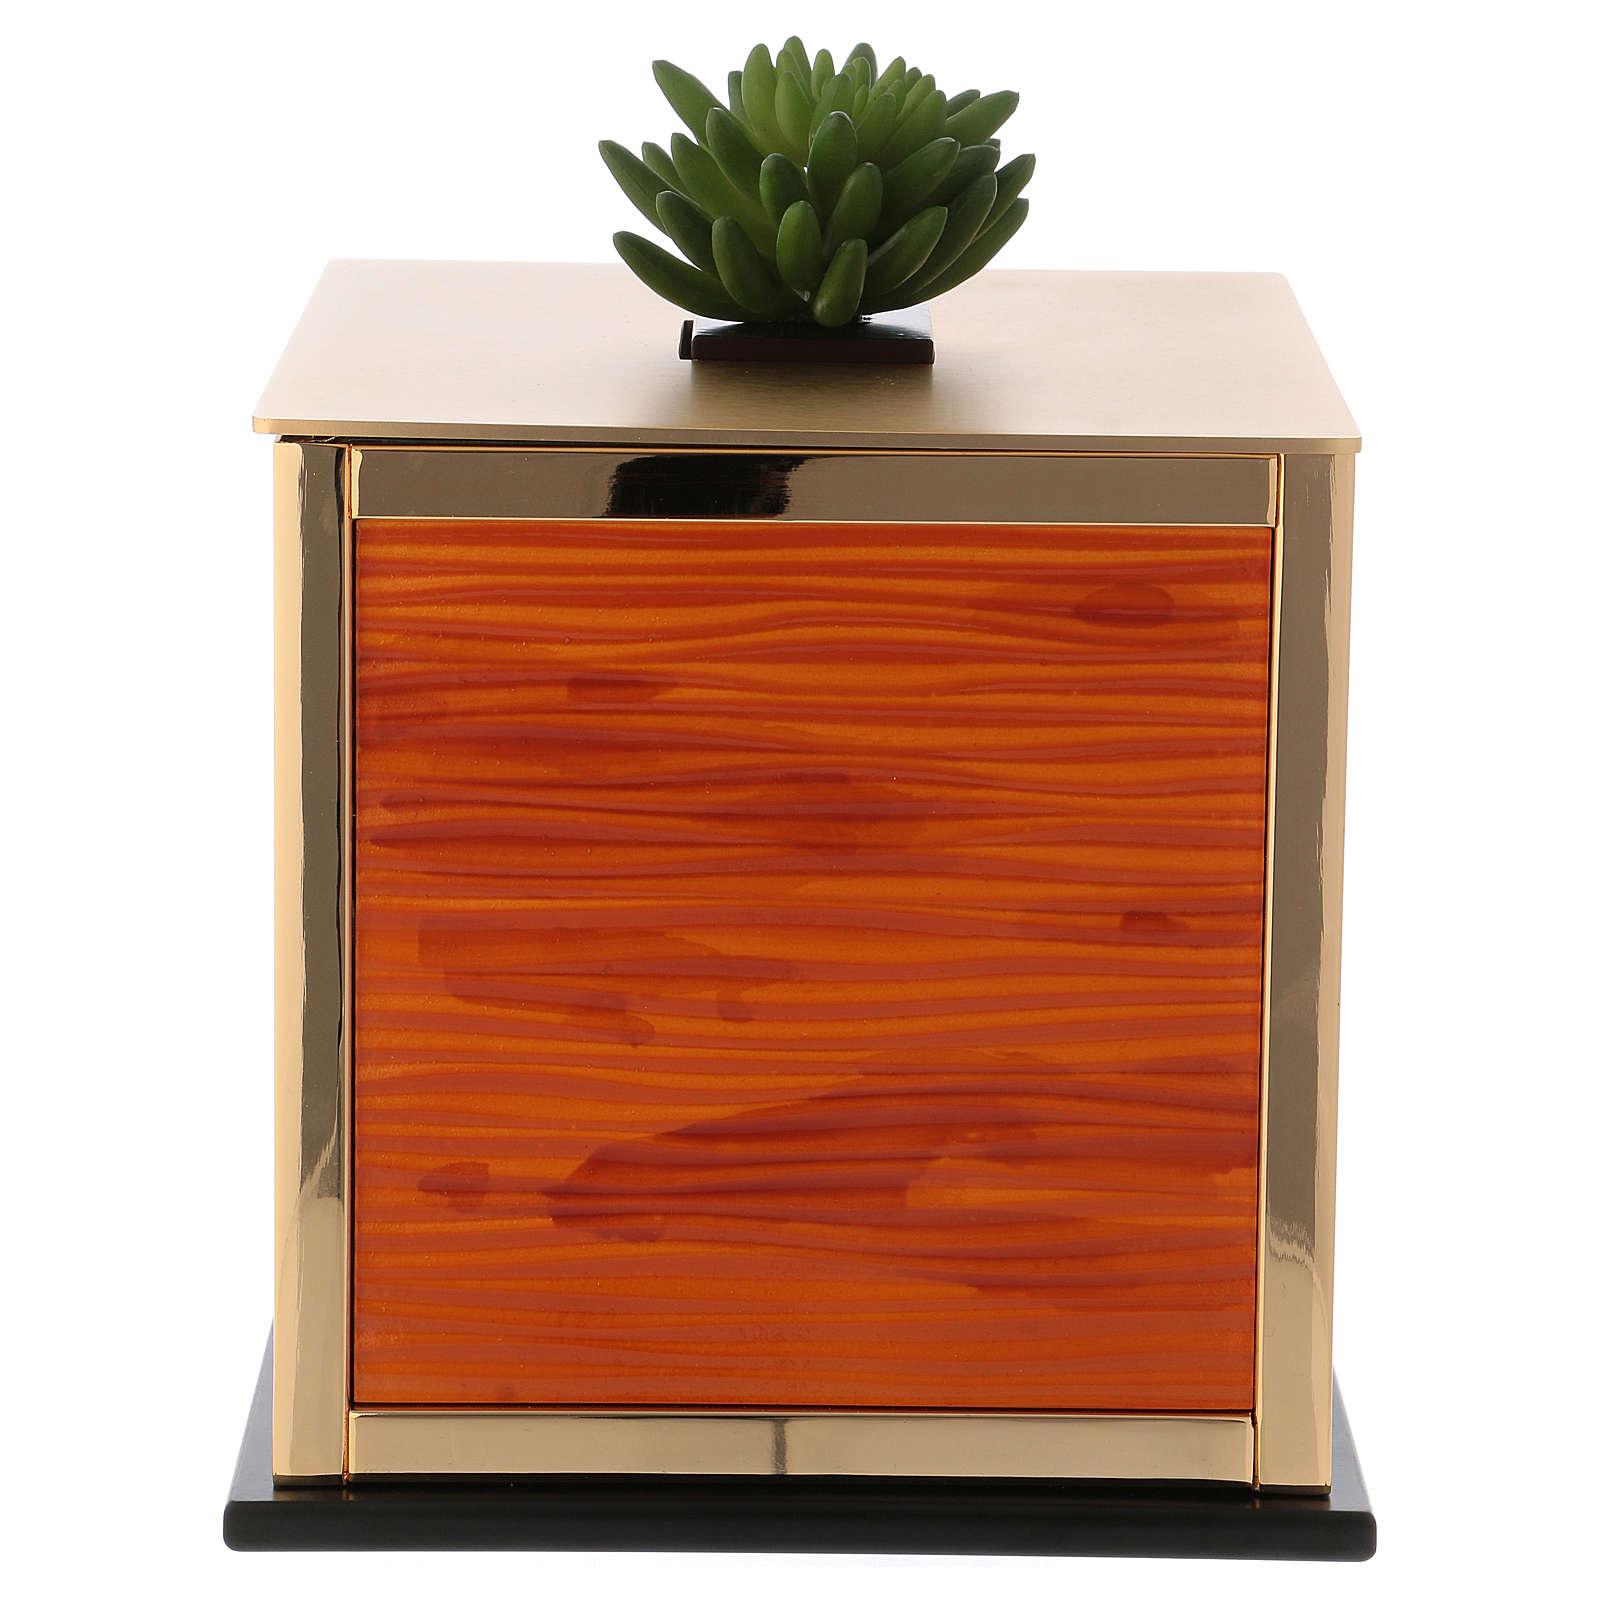 Cremation urn, Ray C. model 3